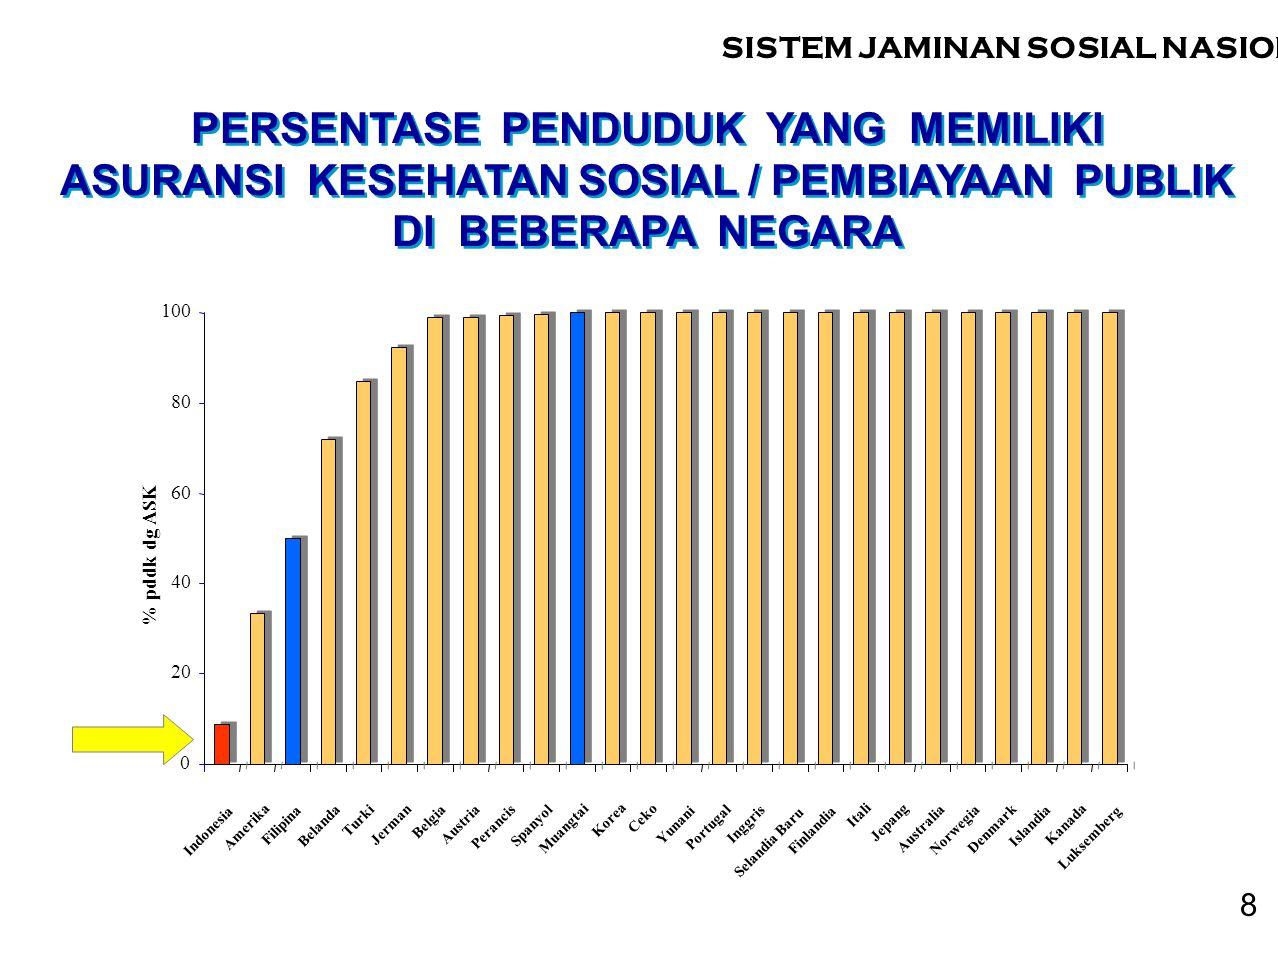 0 20 40 60 80 100 Indonesia Amerika Filipina Belanda Turki Jerman Belgia Austria Perancis Spanyol Muangtai Korea Ceko Yunani Portugal Inggris Selandia